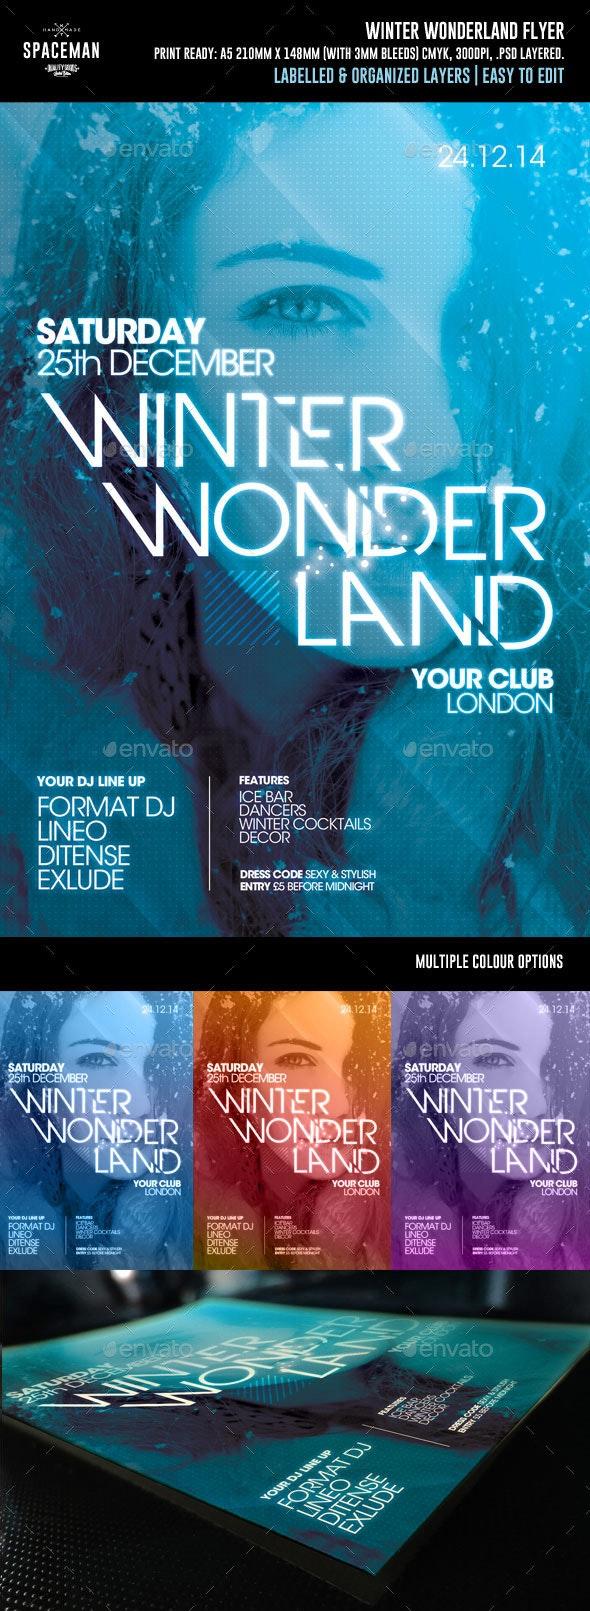 Winter Wonderland Flyer - Clubs & Parties Events